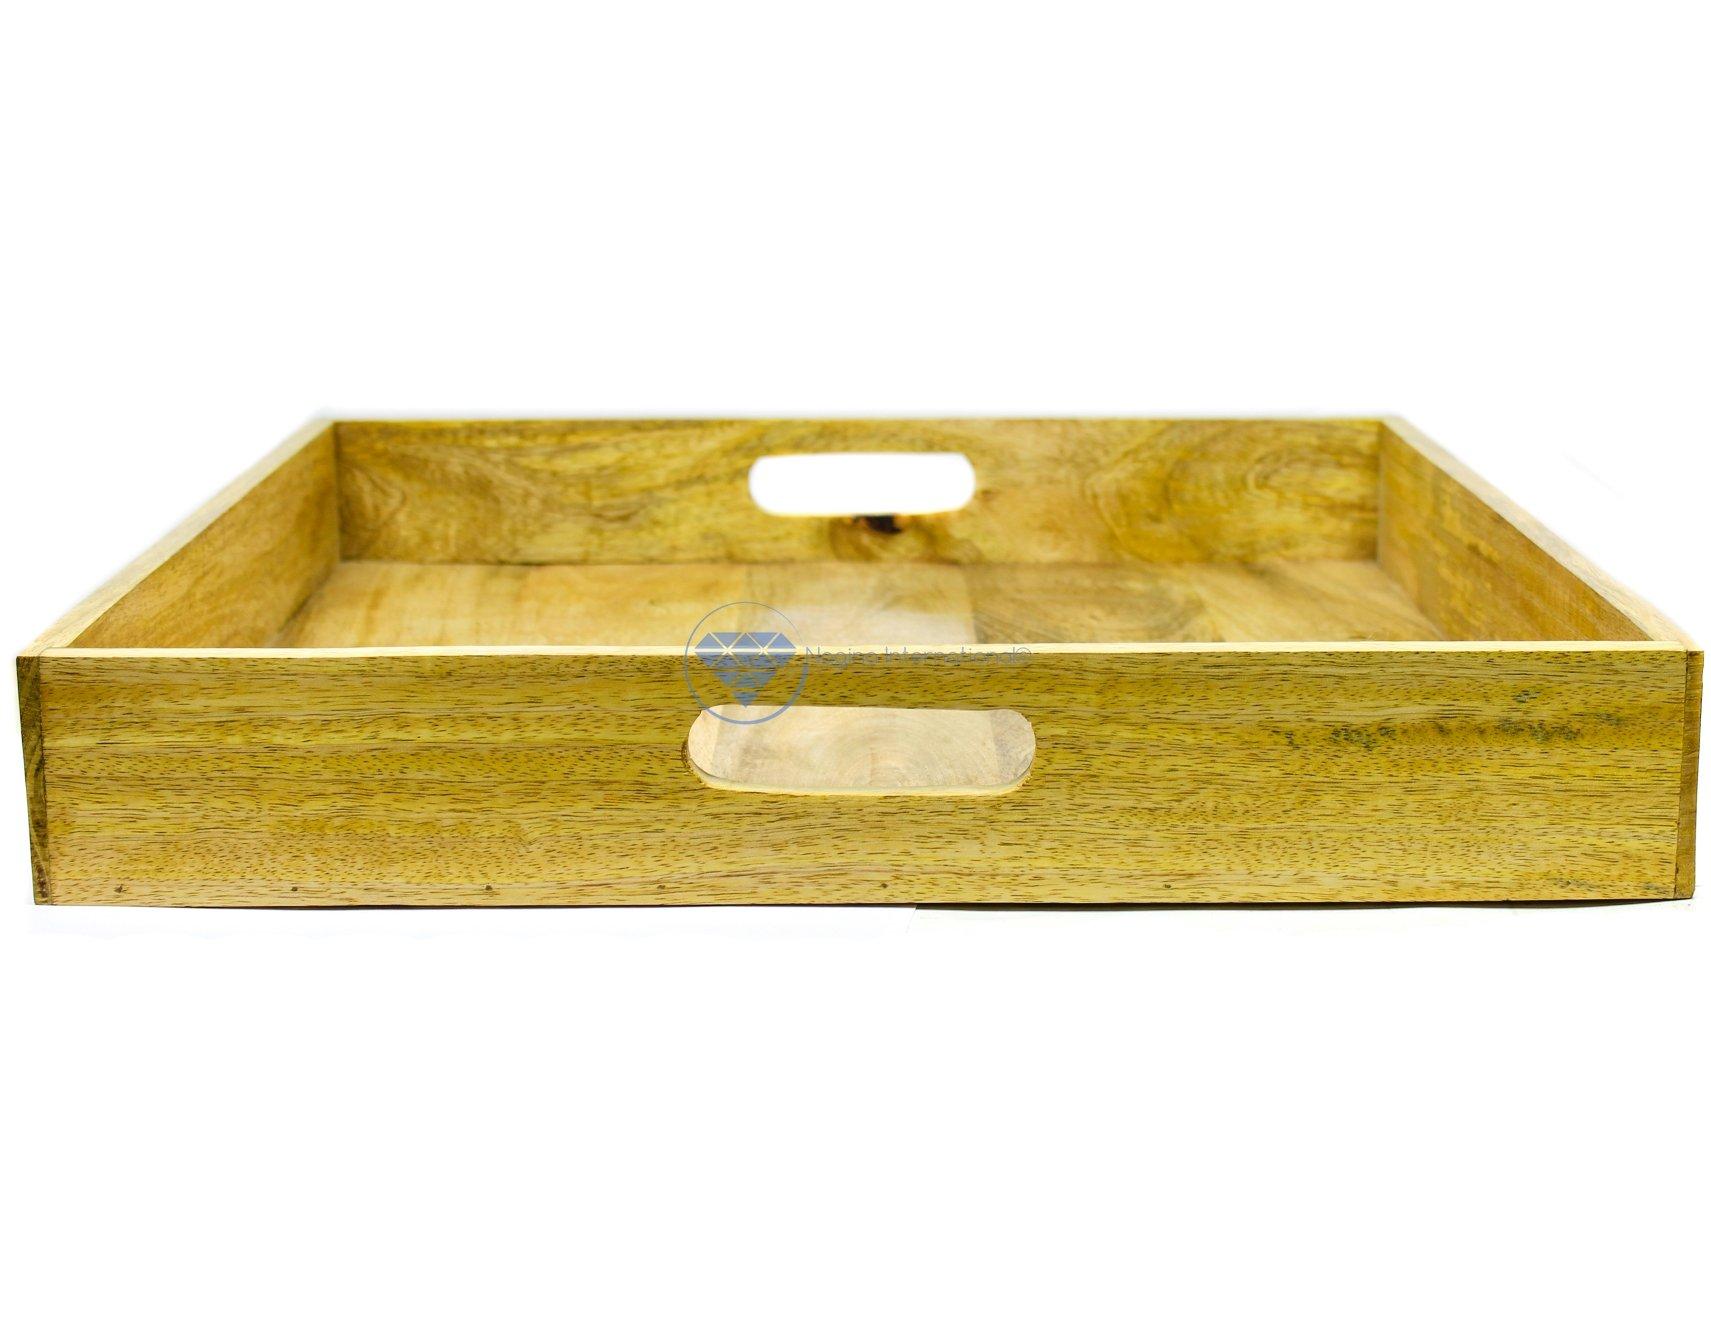 Square Kitchen Serving Tray | Wooden Decor Racks| Nagina International (36 Inches)